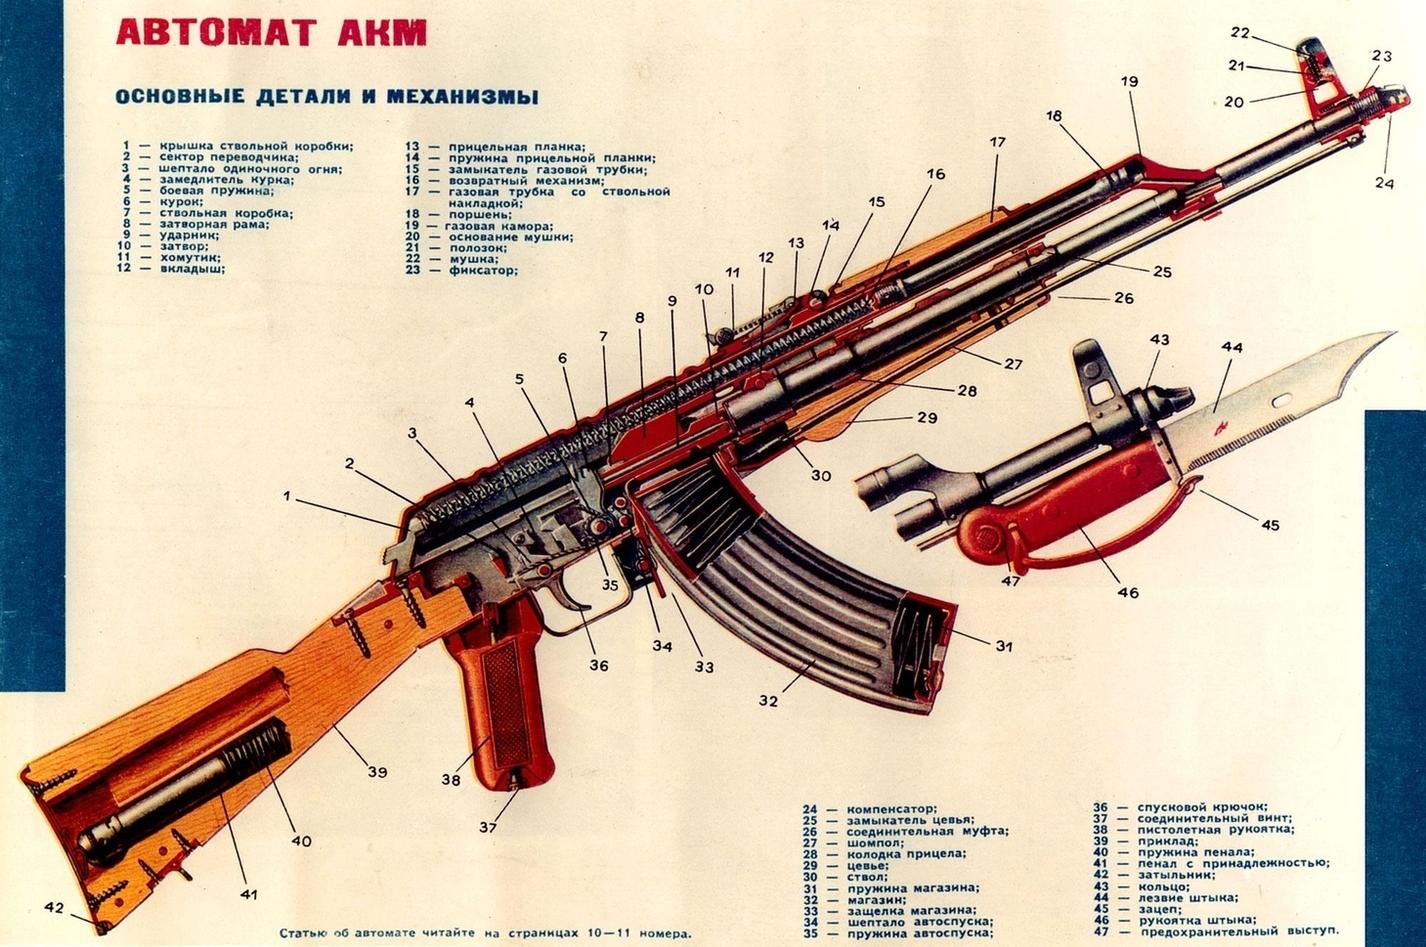 Rifles Of Russian Army Hd Wallpaper: Guns And Ammo: AK 47